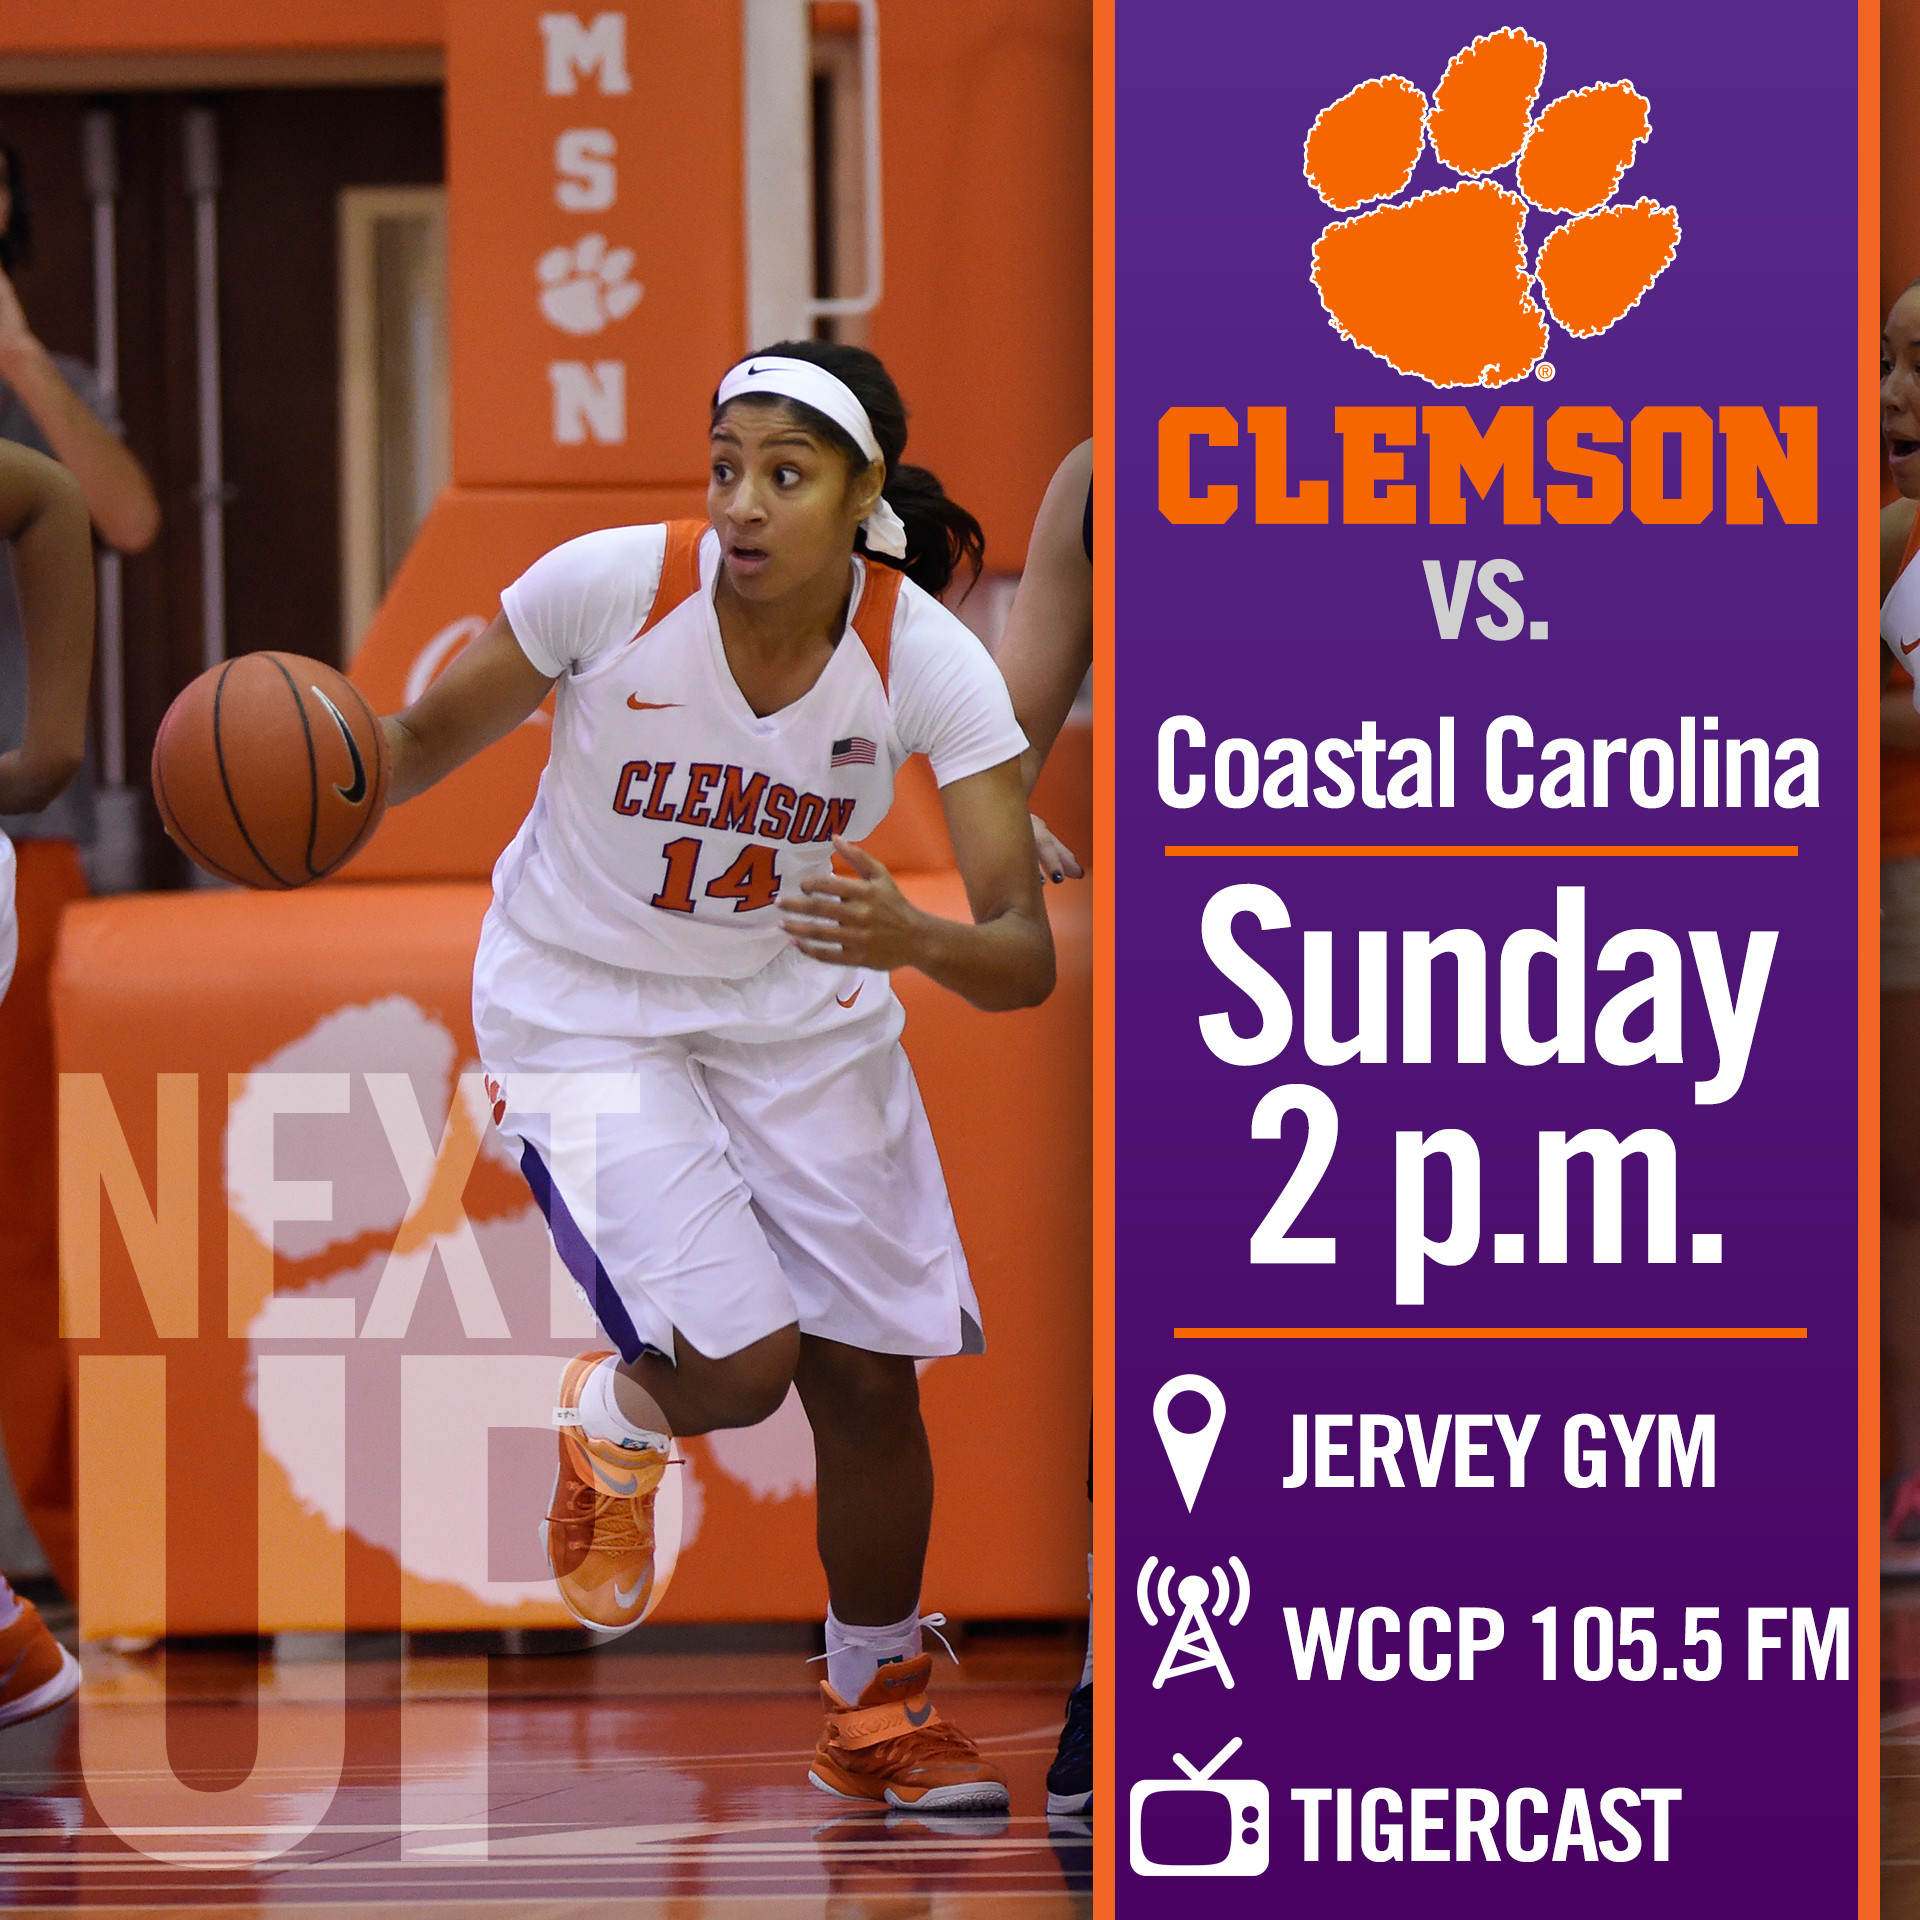 Tigers Host Coastal Carolina Sunday at 2 p.m. in Jervey Gym